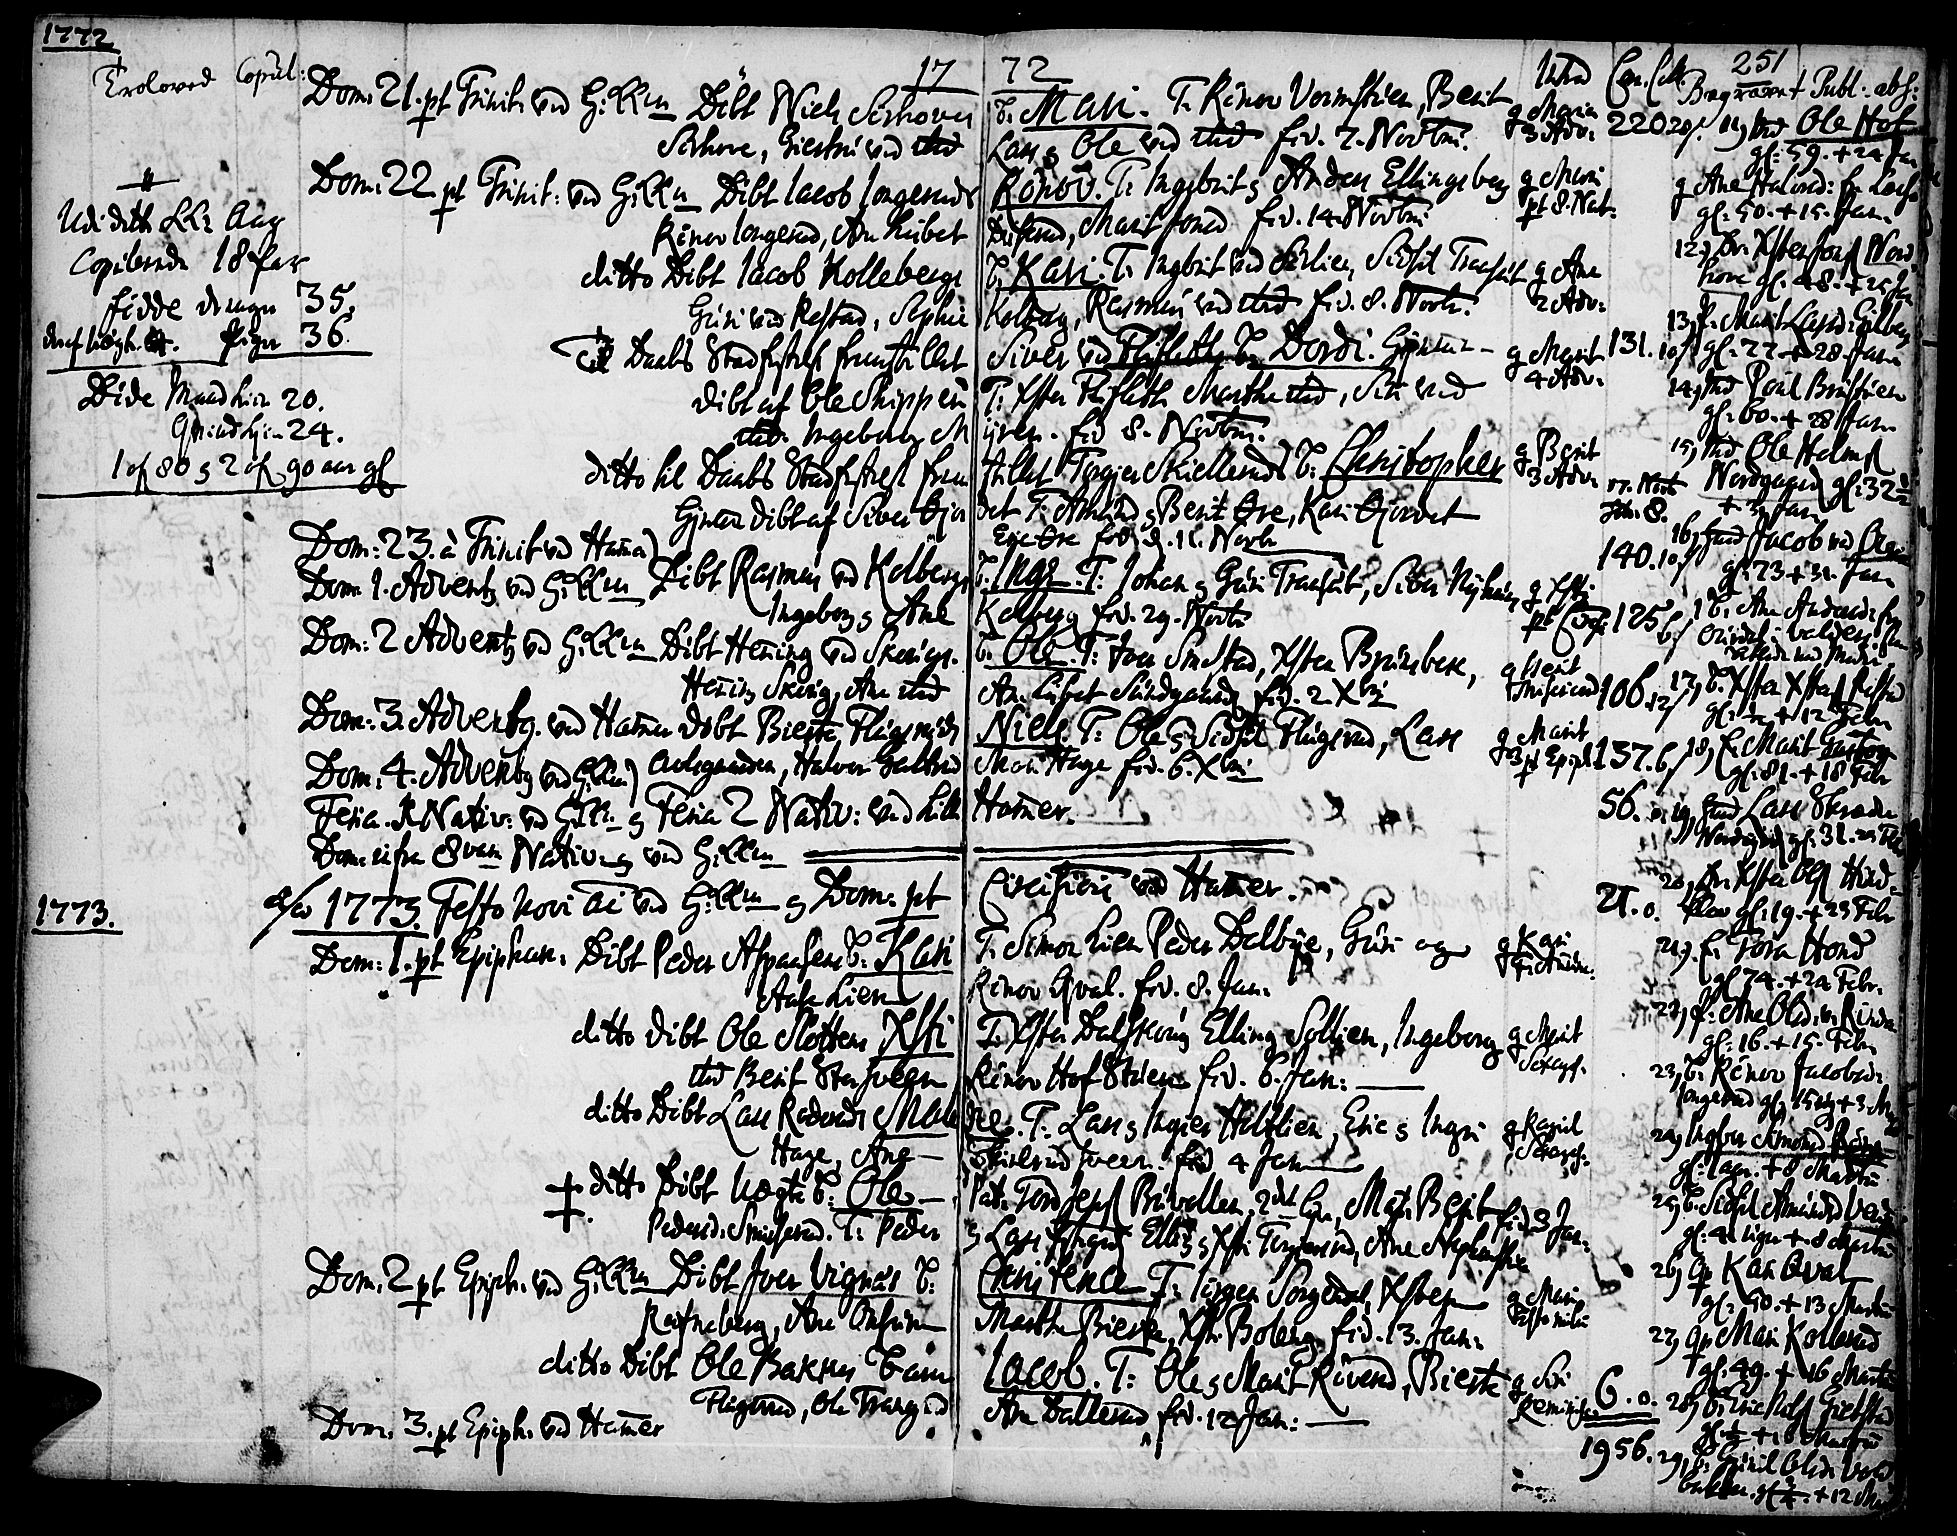 SAH, Fåberg prestekontor, Ministerialbok nr. 1, 1727-1775, s. 251